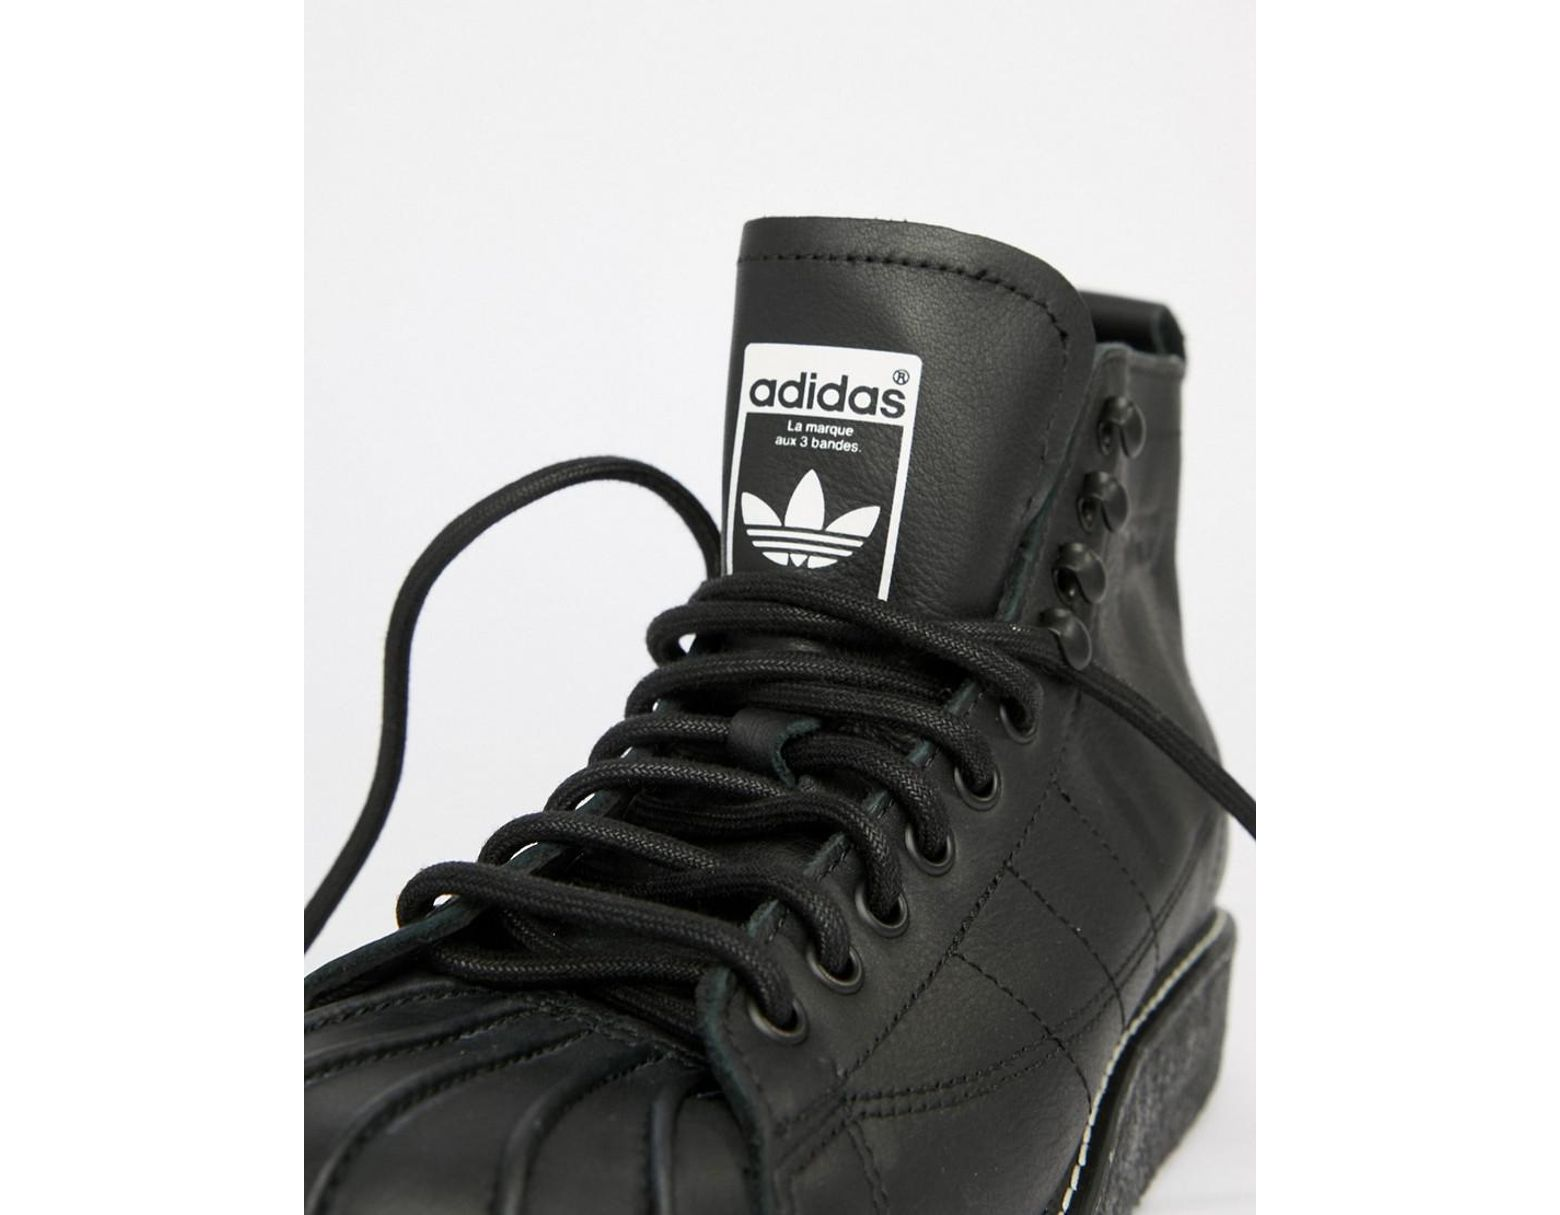 Unisex Adidas Originals Superstar 2.5 WhiteBlue Casual Shoes Trainers Size US 4 10665561